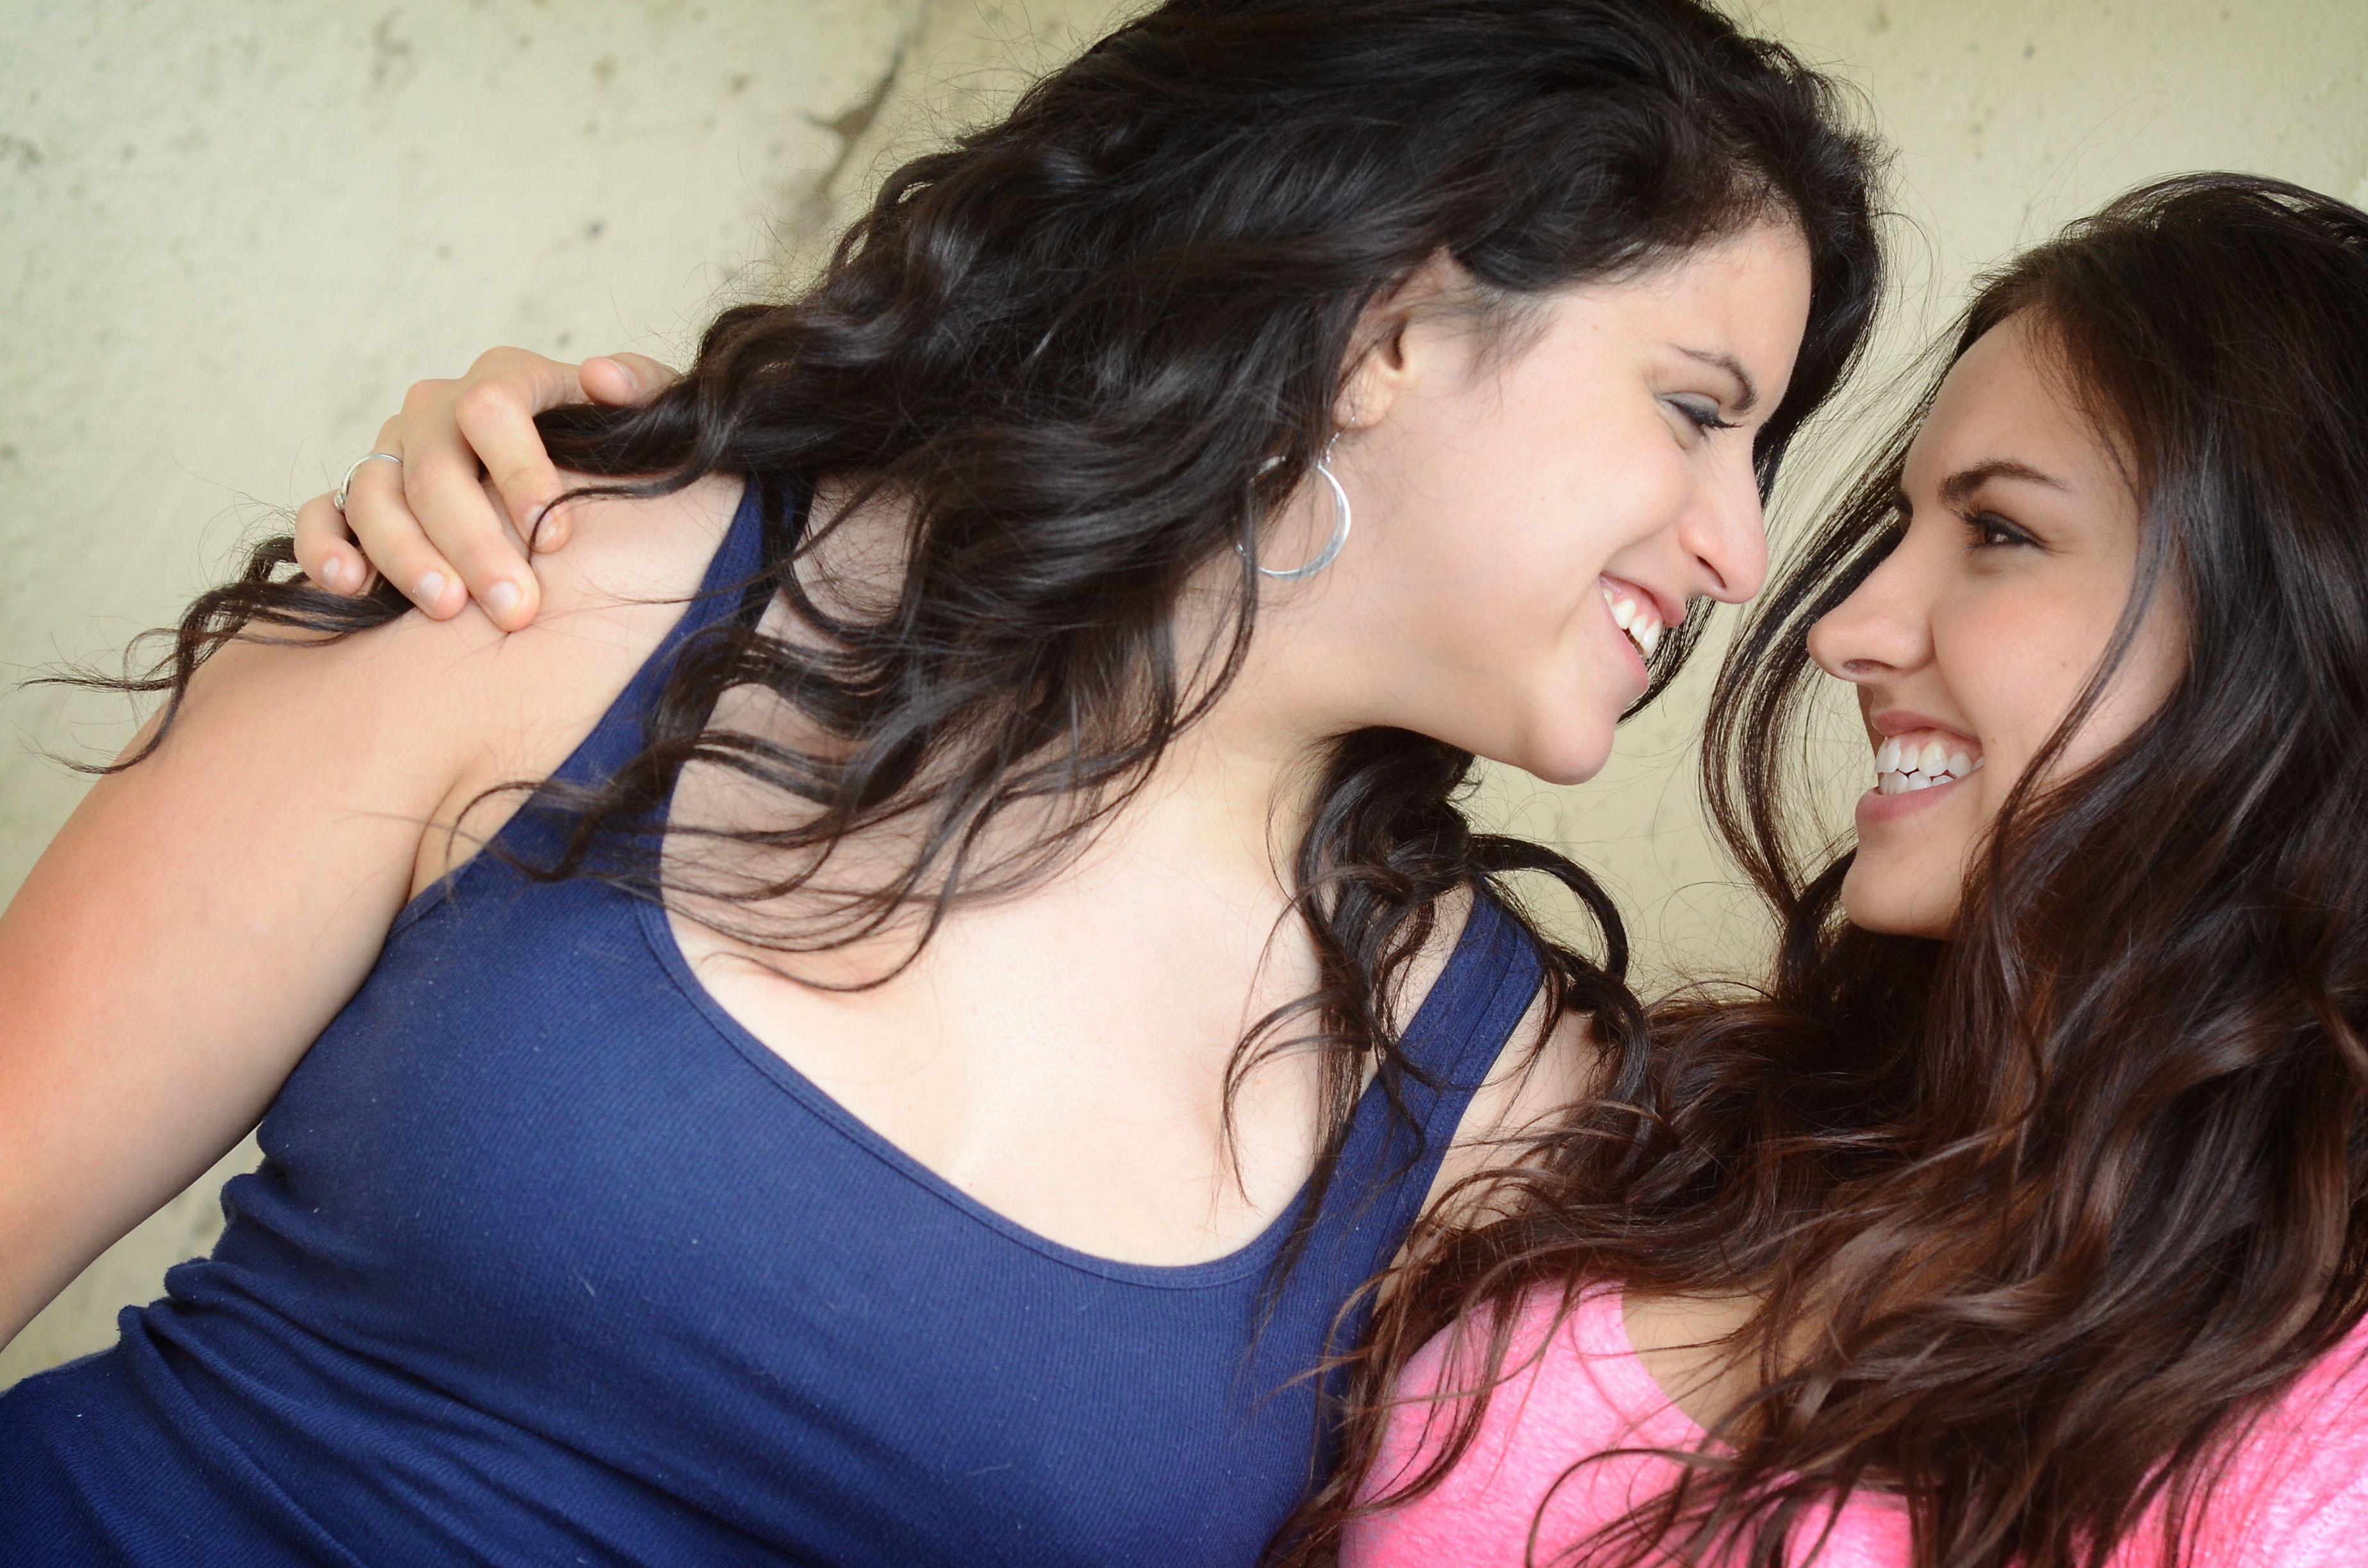 Latina lesbian pornstar videos